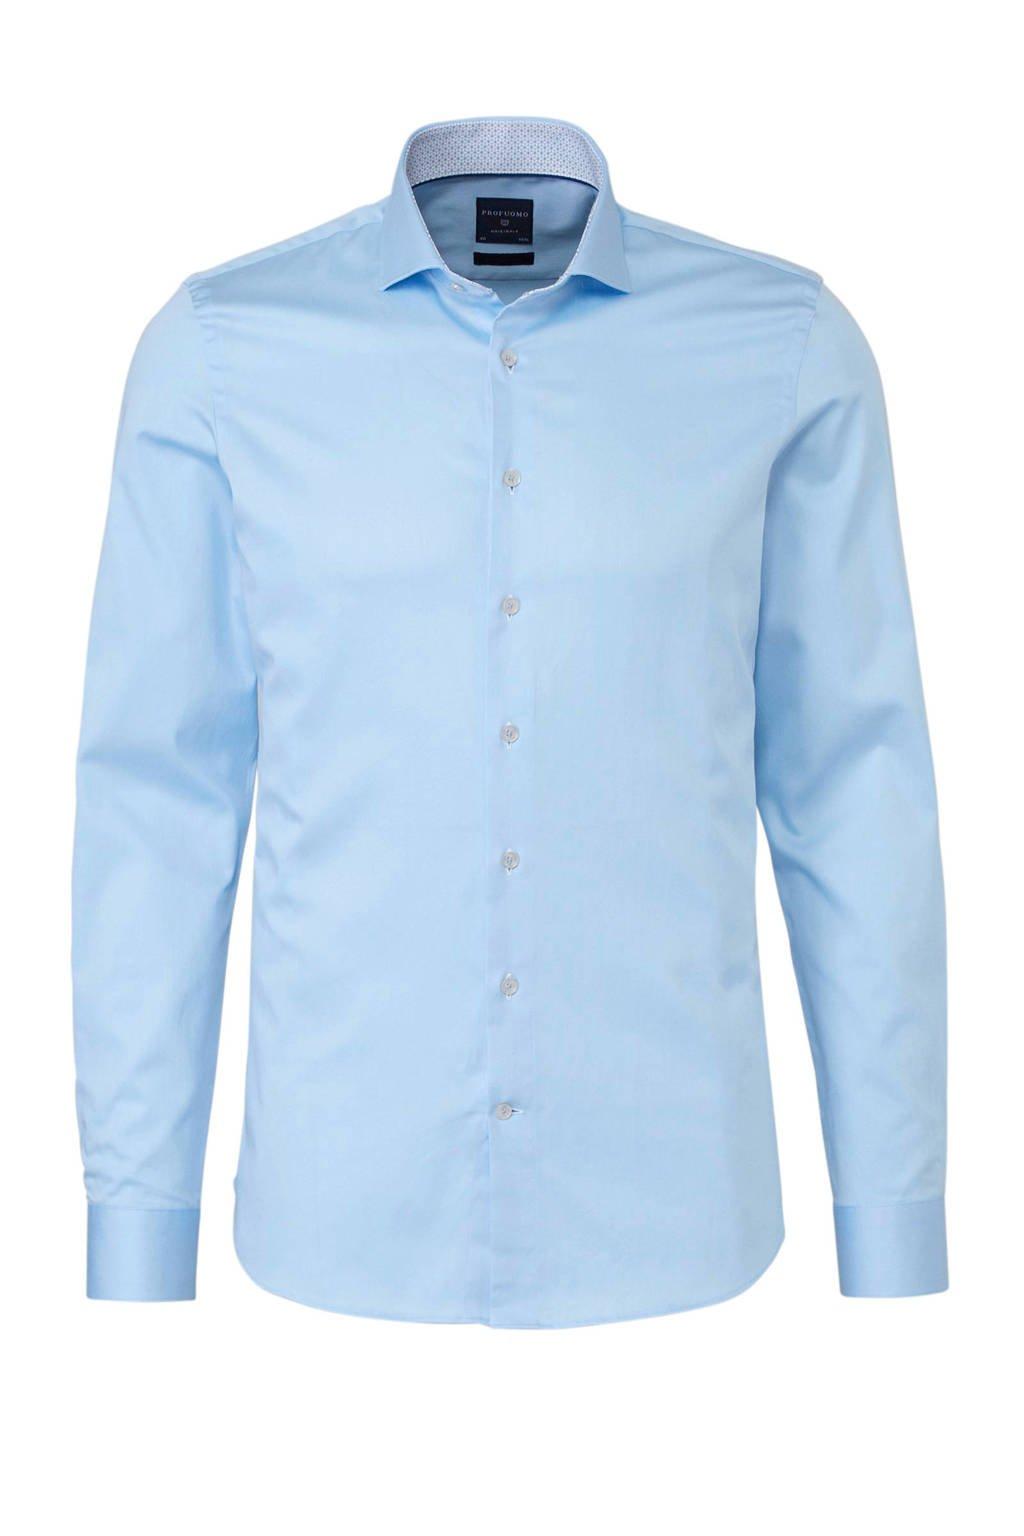 Profuomo super slim fit overhemd blauw, Blauw